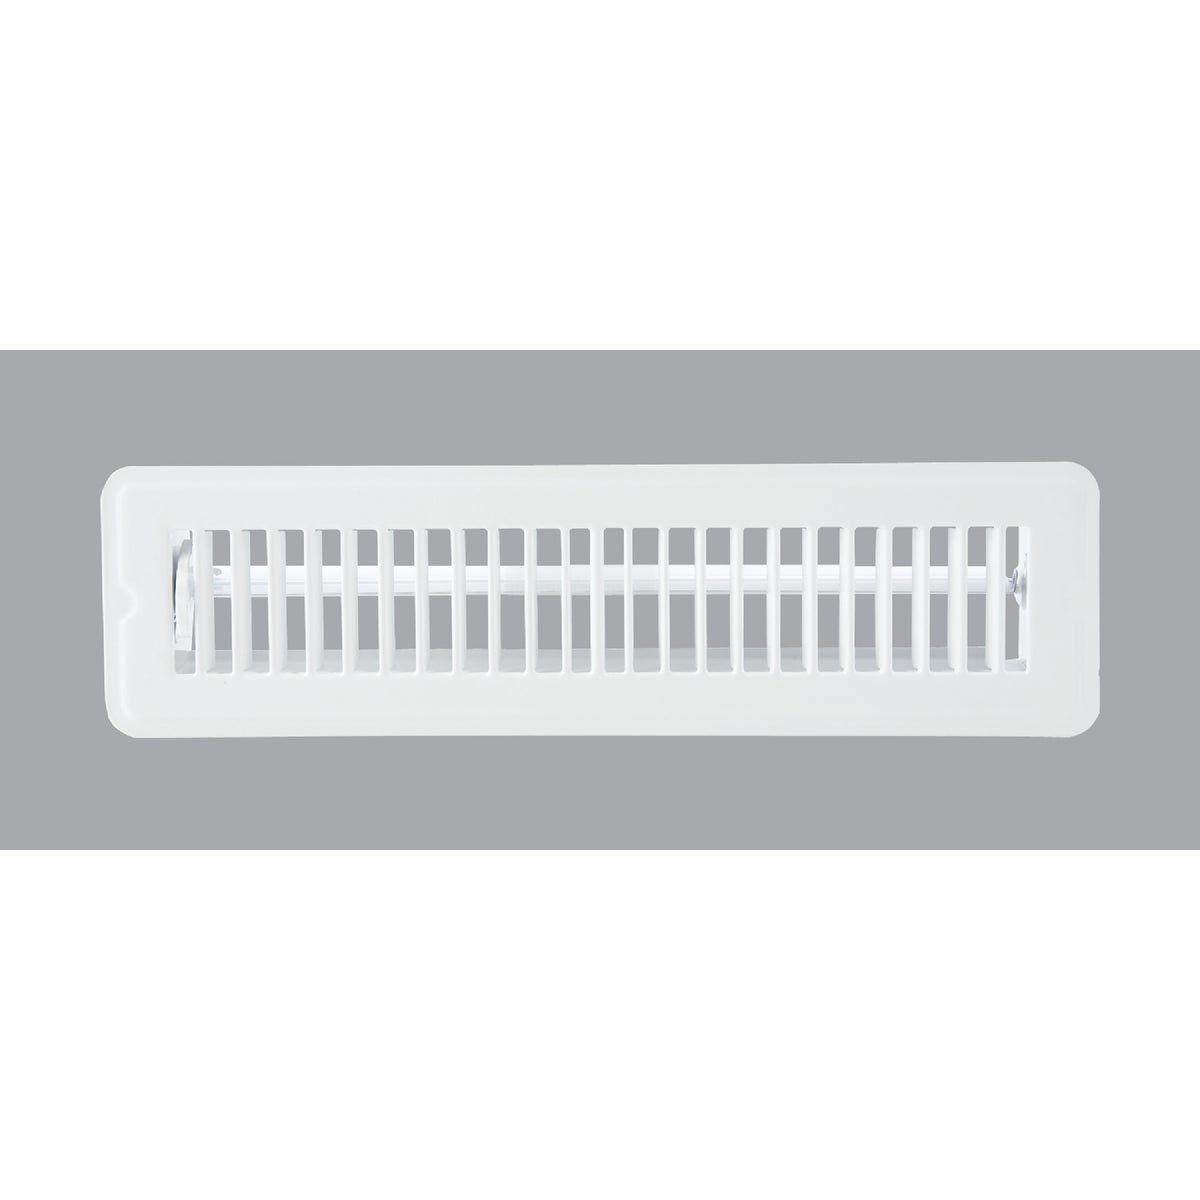 Home Impressions Steel Floor Register, 1FL0212WH-NH